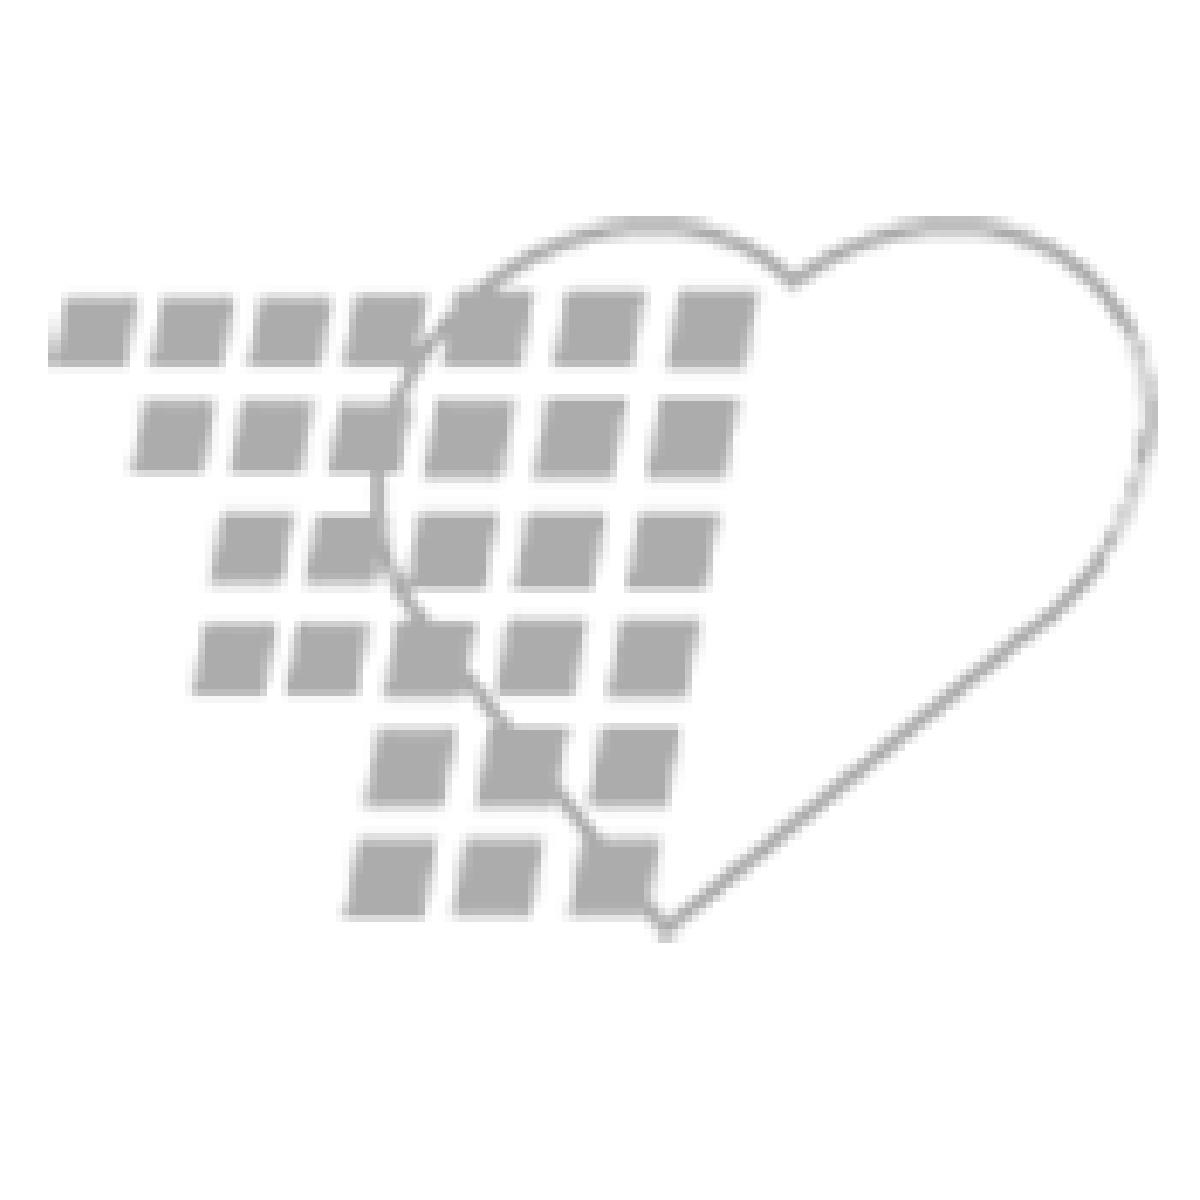 07-71-5020 Argyle™ Trocar Catheter, Sharp Tip